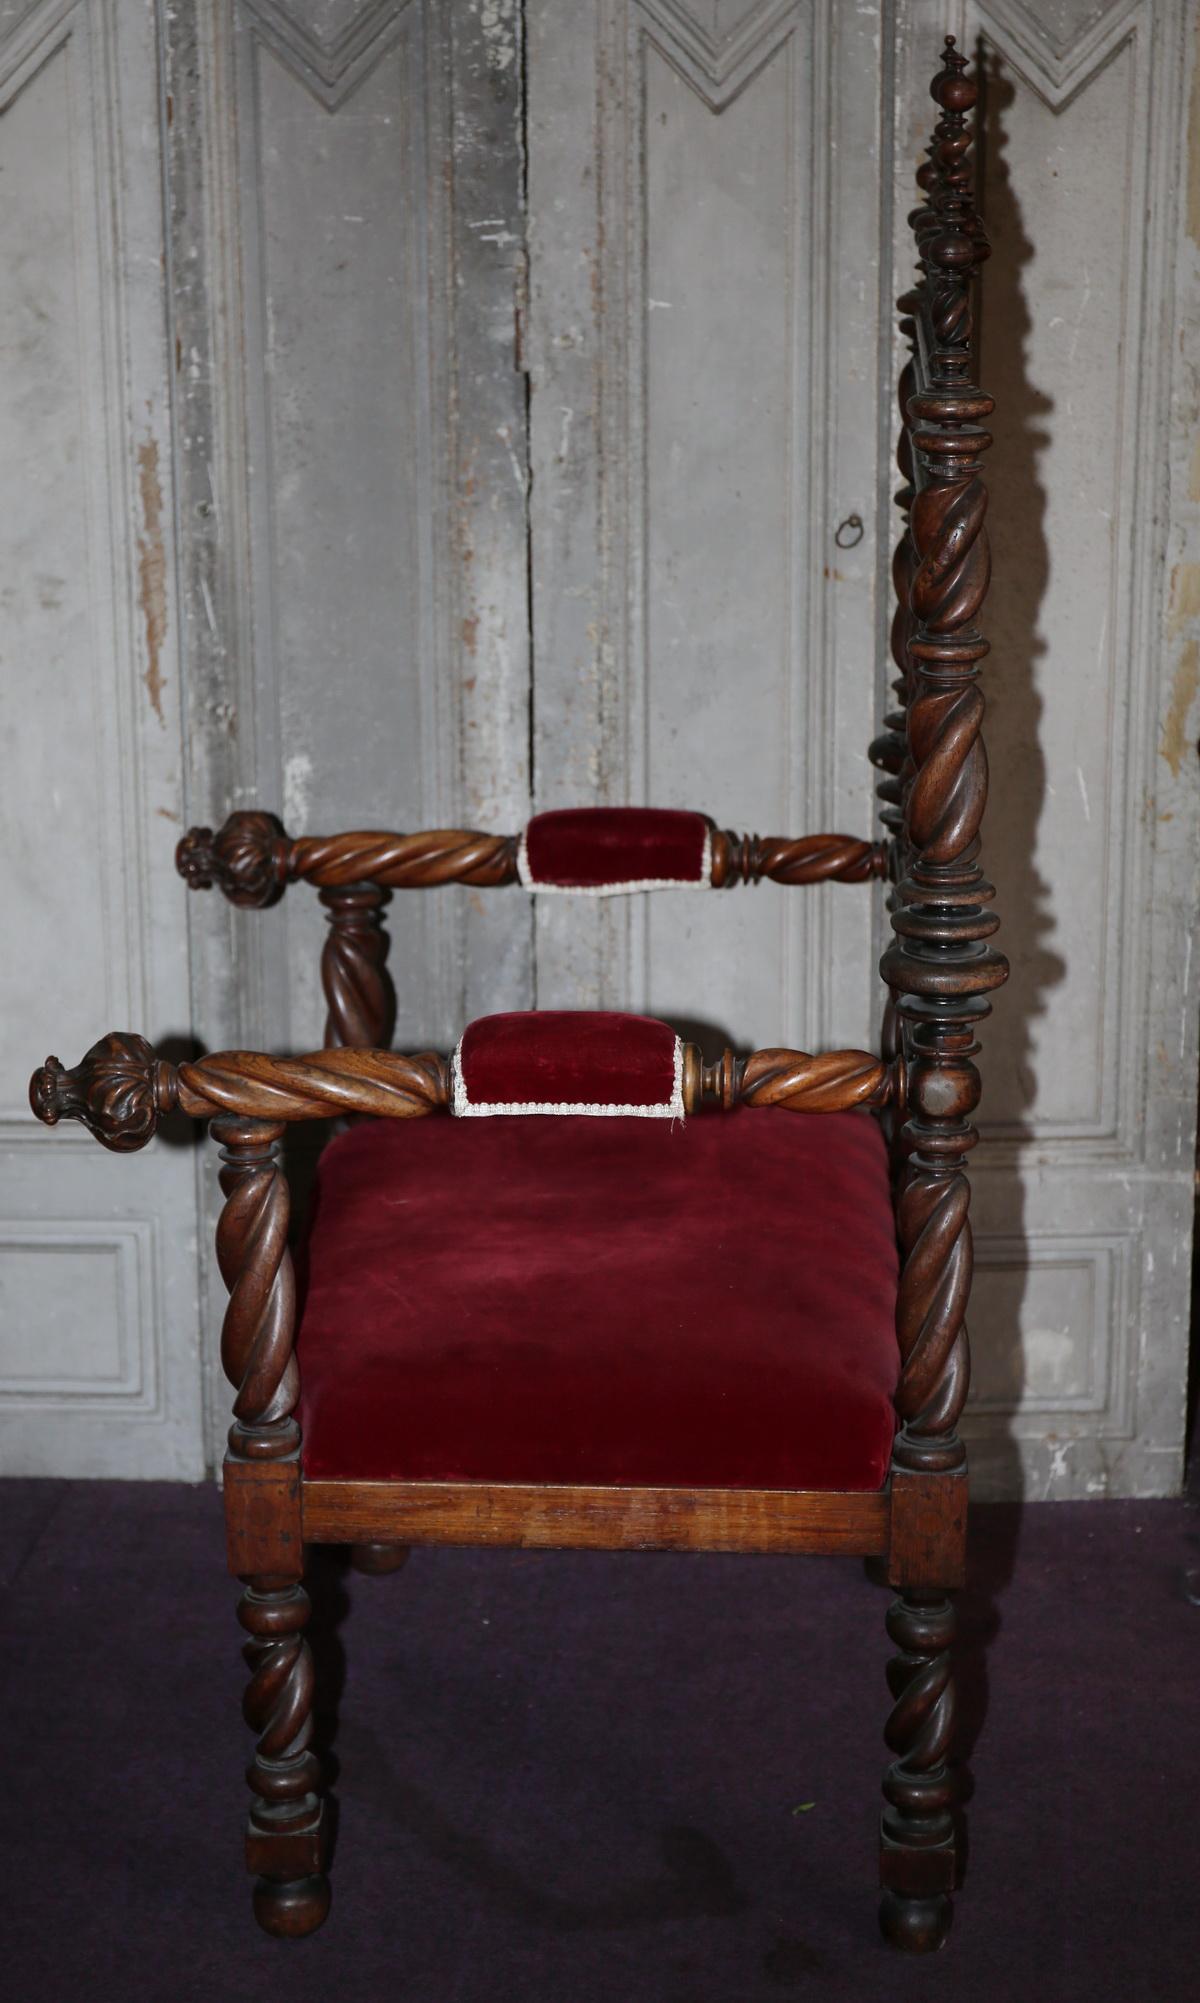 Fauteuil portugais fin XVIII